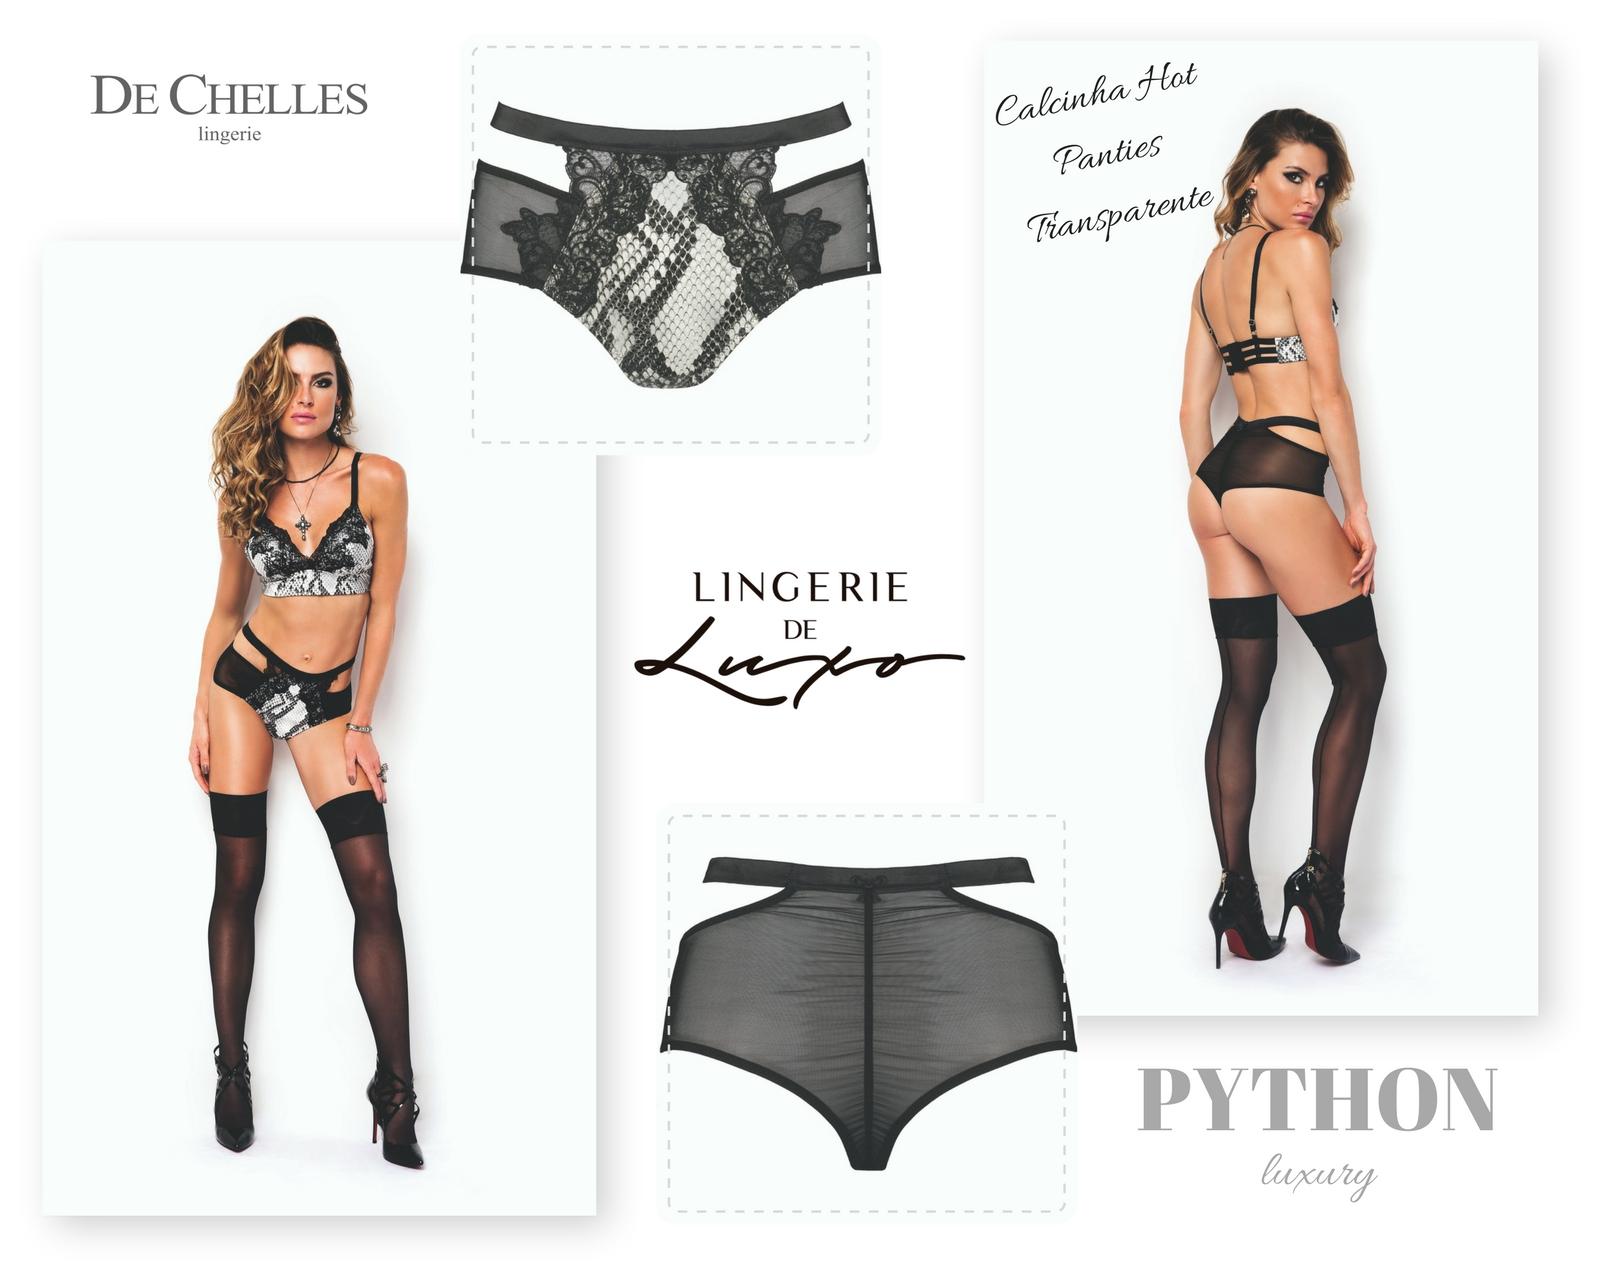 Calcinha Hot Panties Transparente Python Luxury